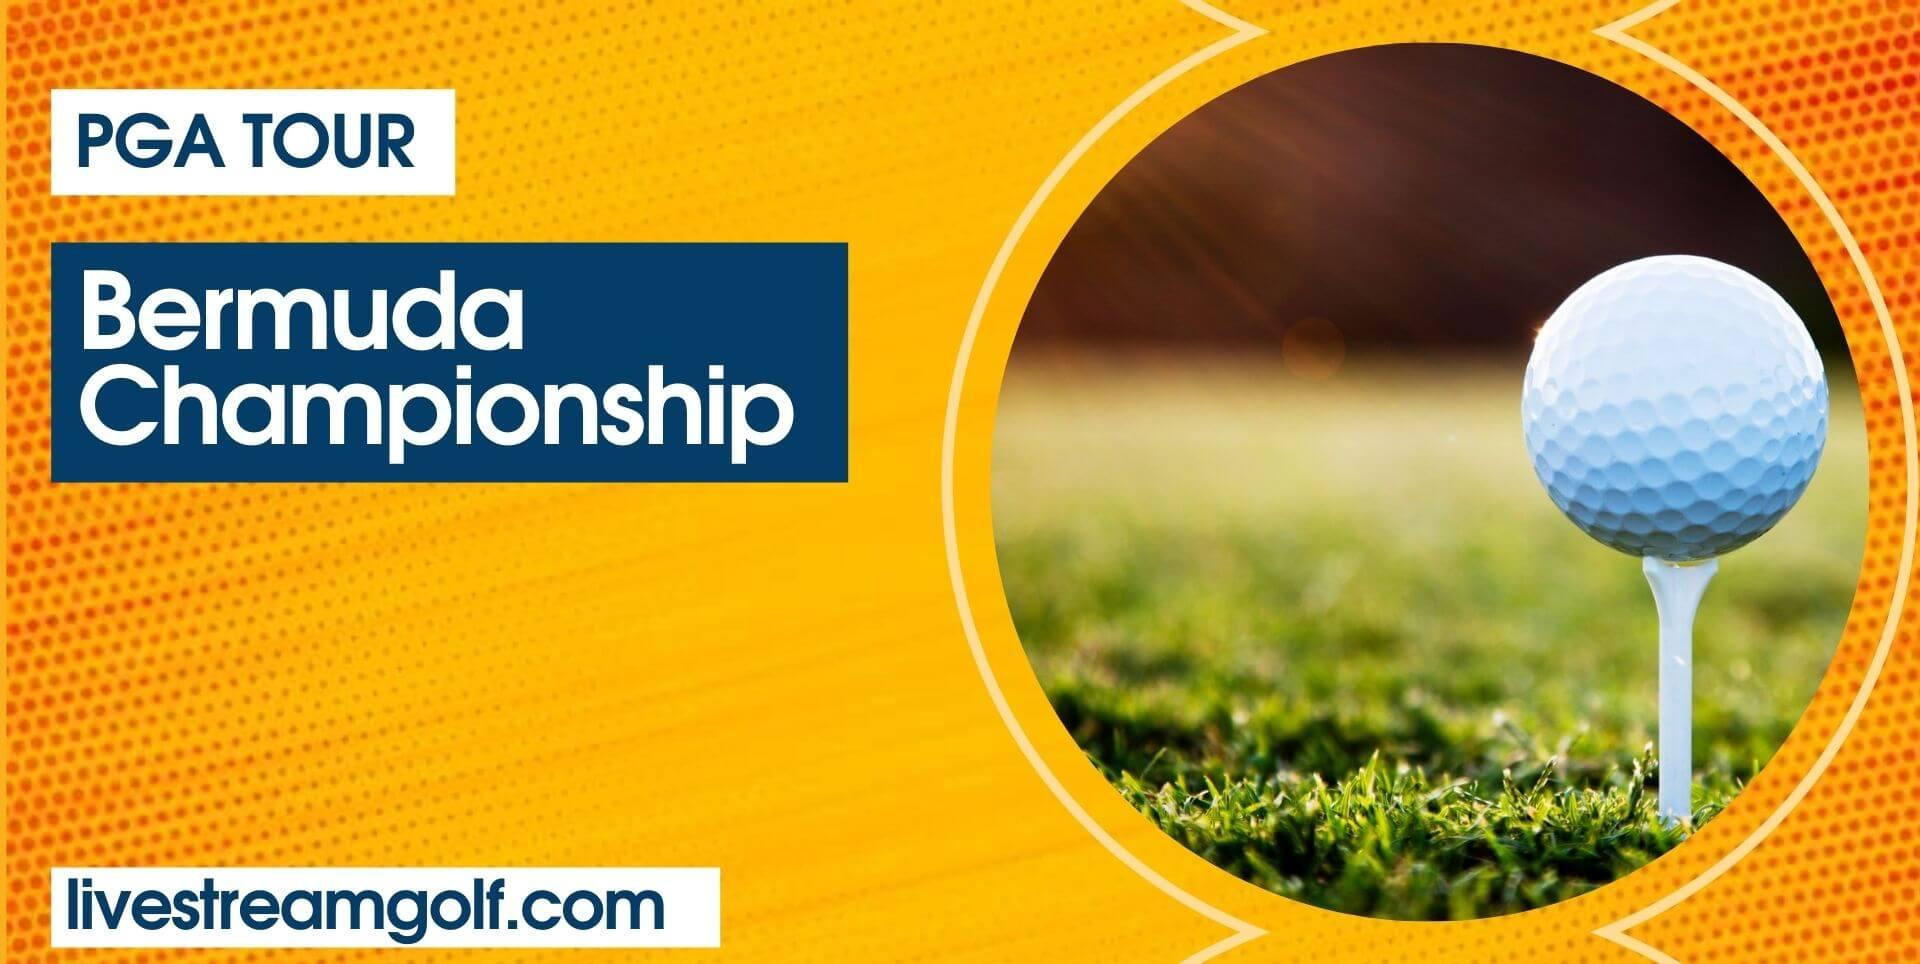 Bermuda Championship Rd 2 Live Stream: PGA Tour 2021